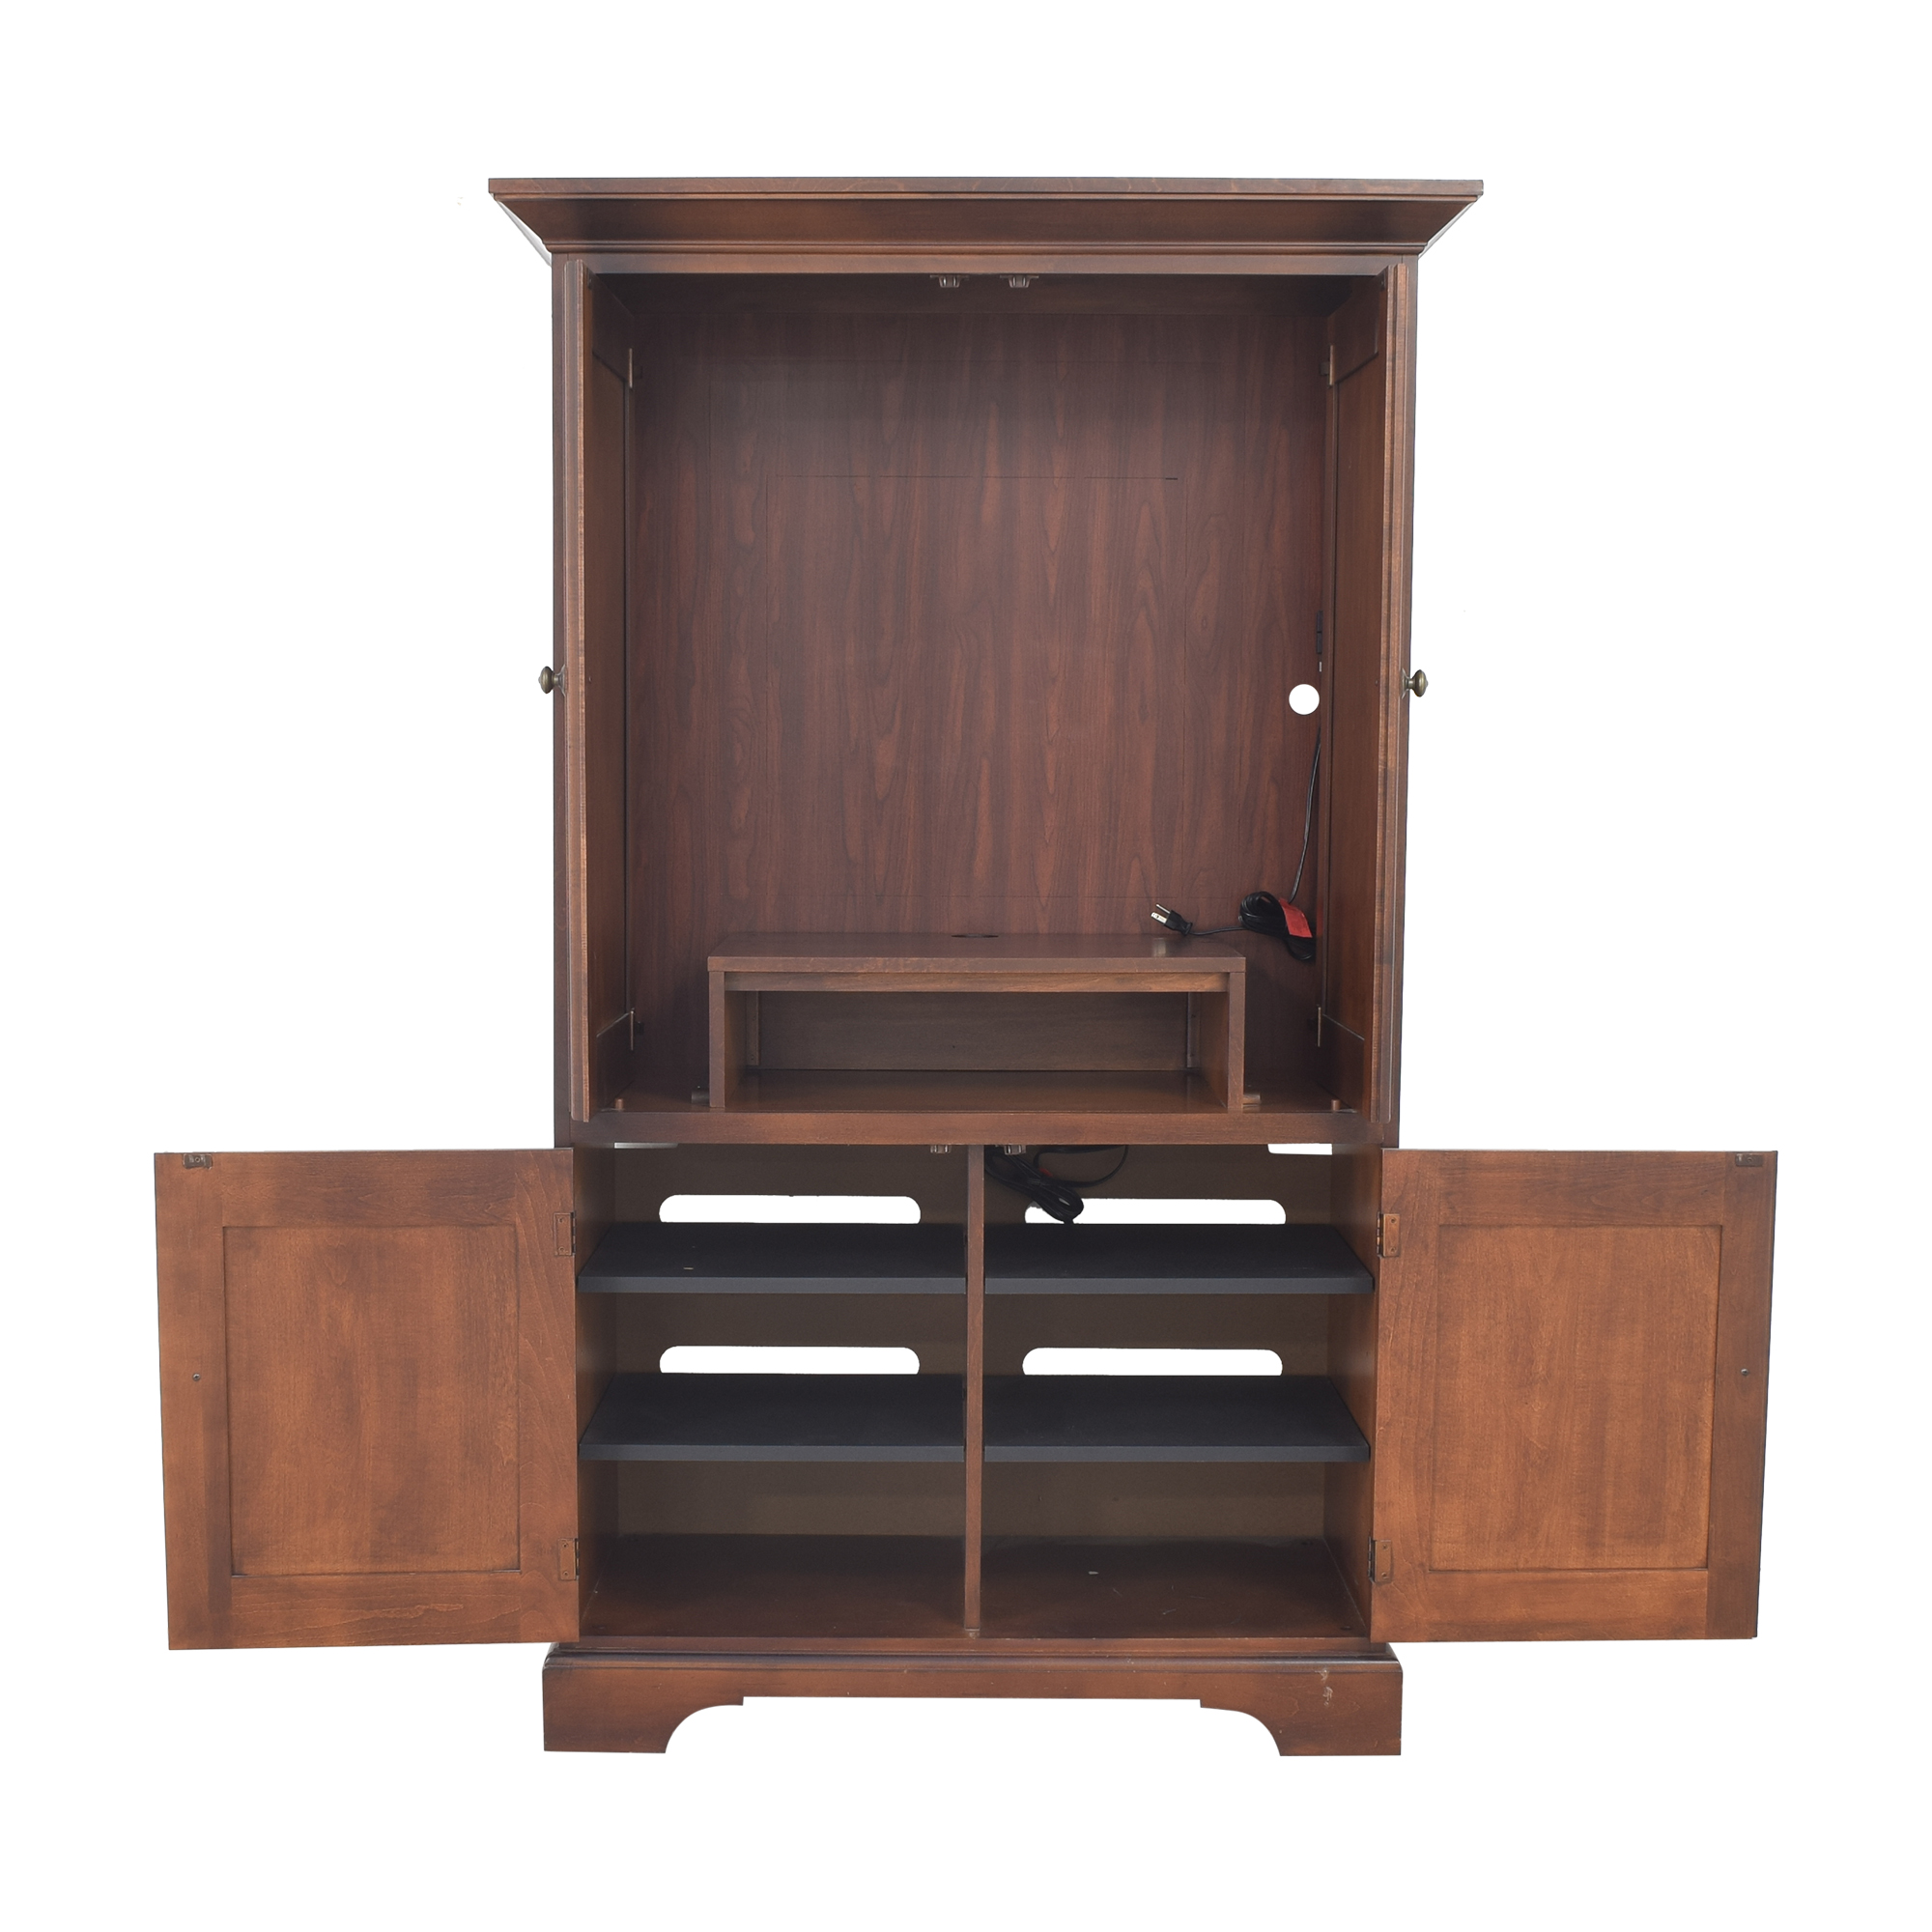 shop Hooker Furniture Hooker Media Armoire online